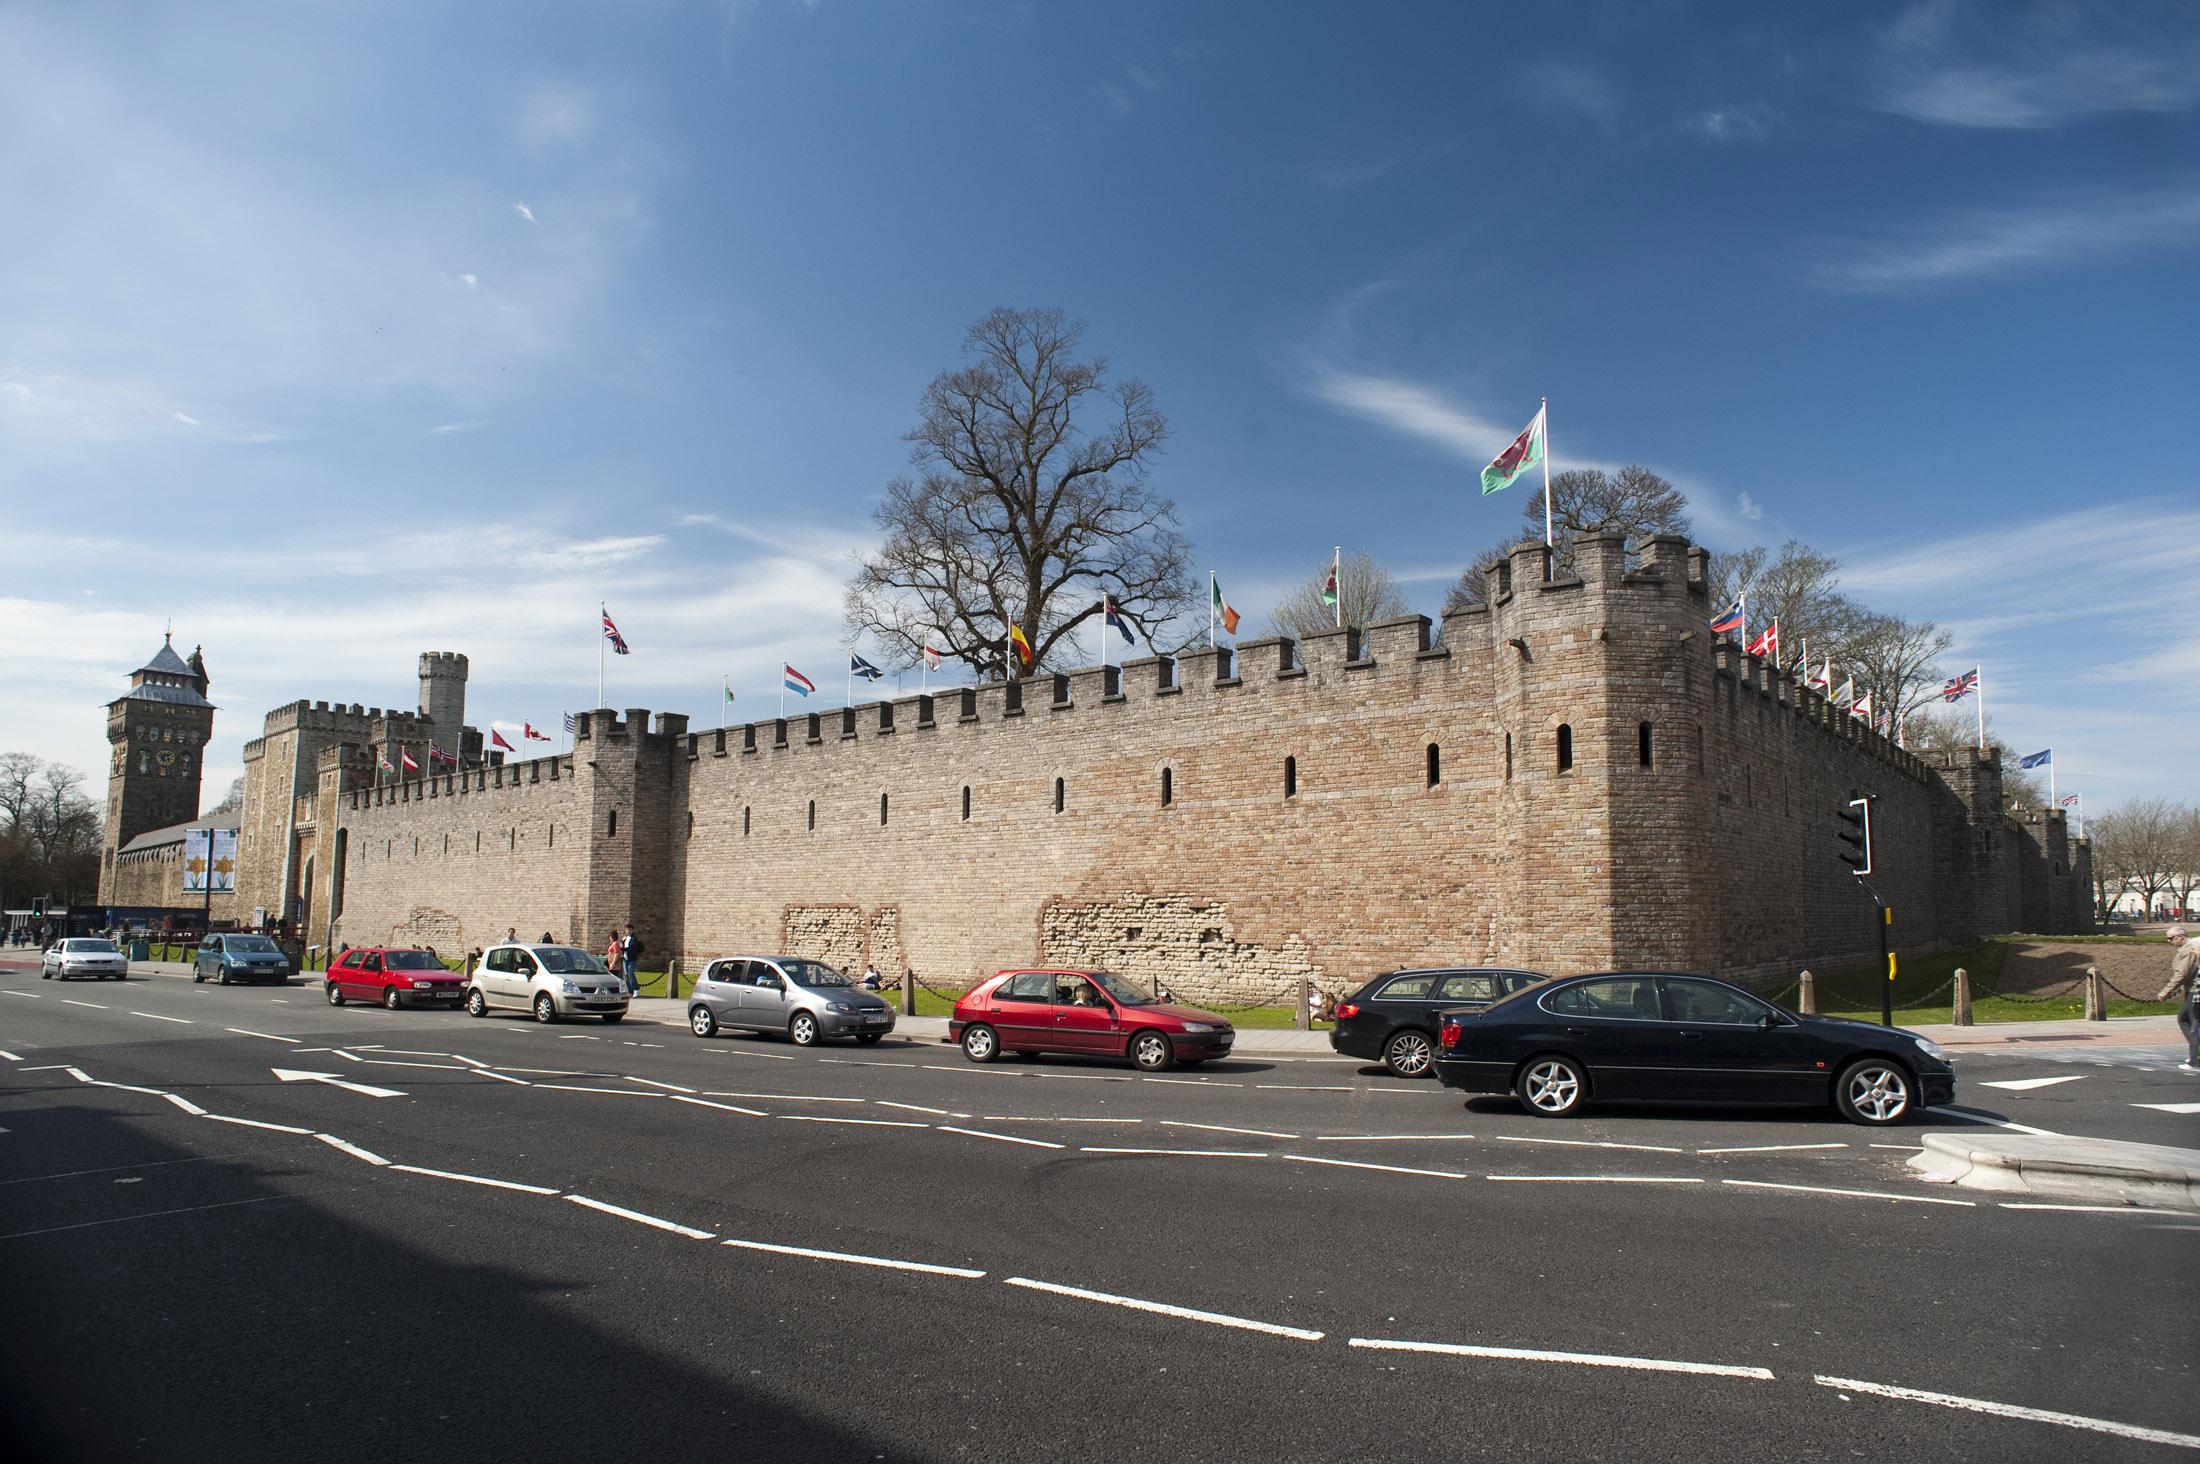 File:Cardiff Castle walls.jpg - Wikimedia Commons